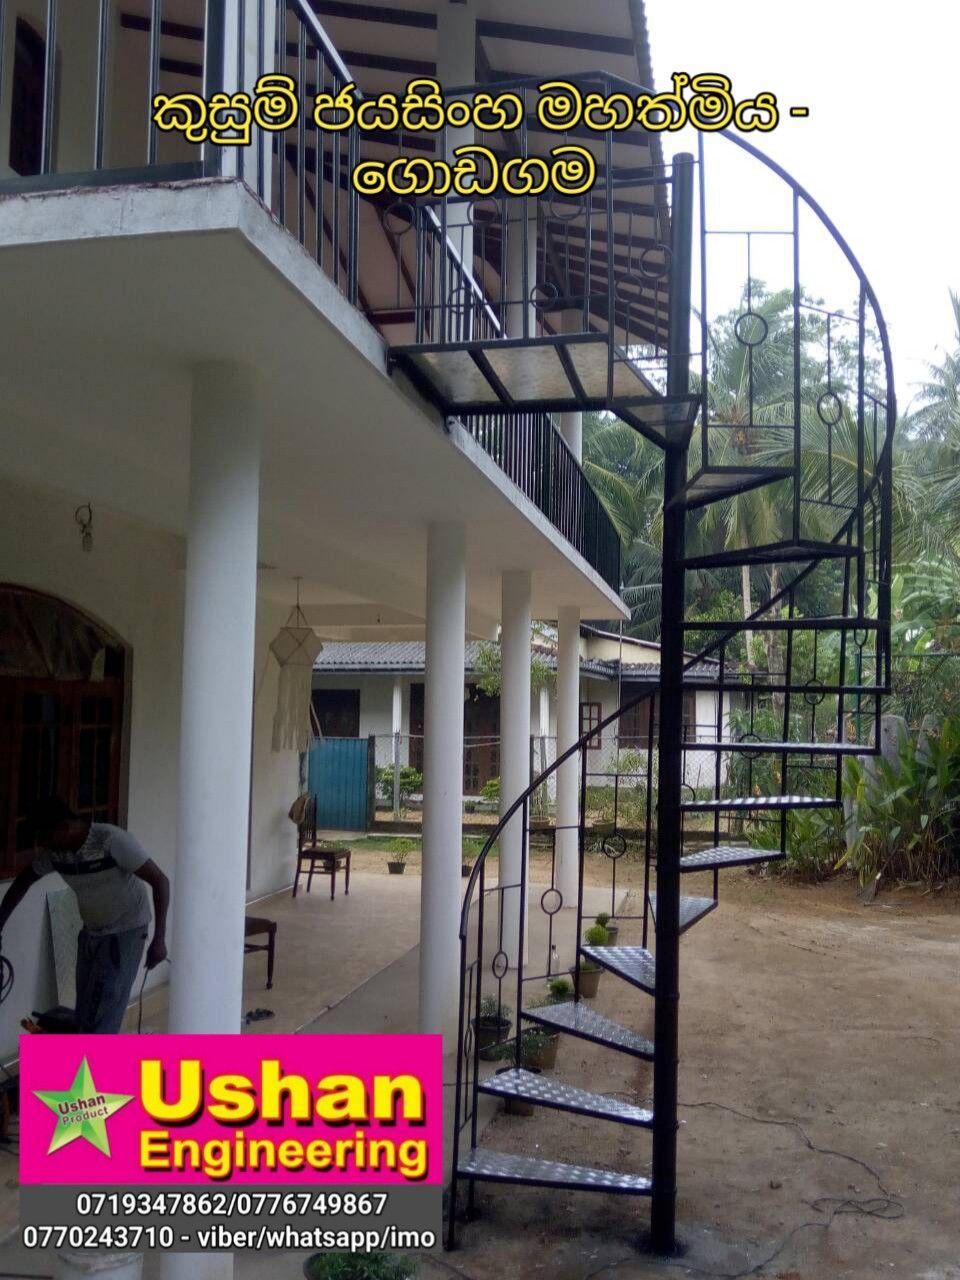 Handrail Design Sri Lanka Steel Handrail Sri Lanka Balcony Railing Sri Lanka Stair Cases Metal Balcony Rai Balcony Railing Steel Handrail Handrail Design